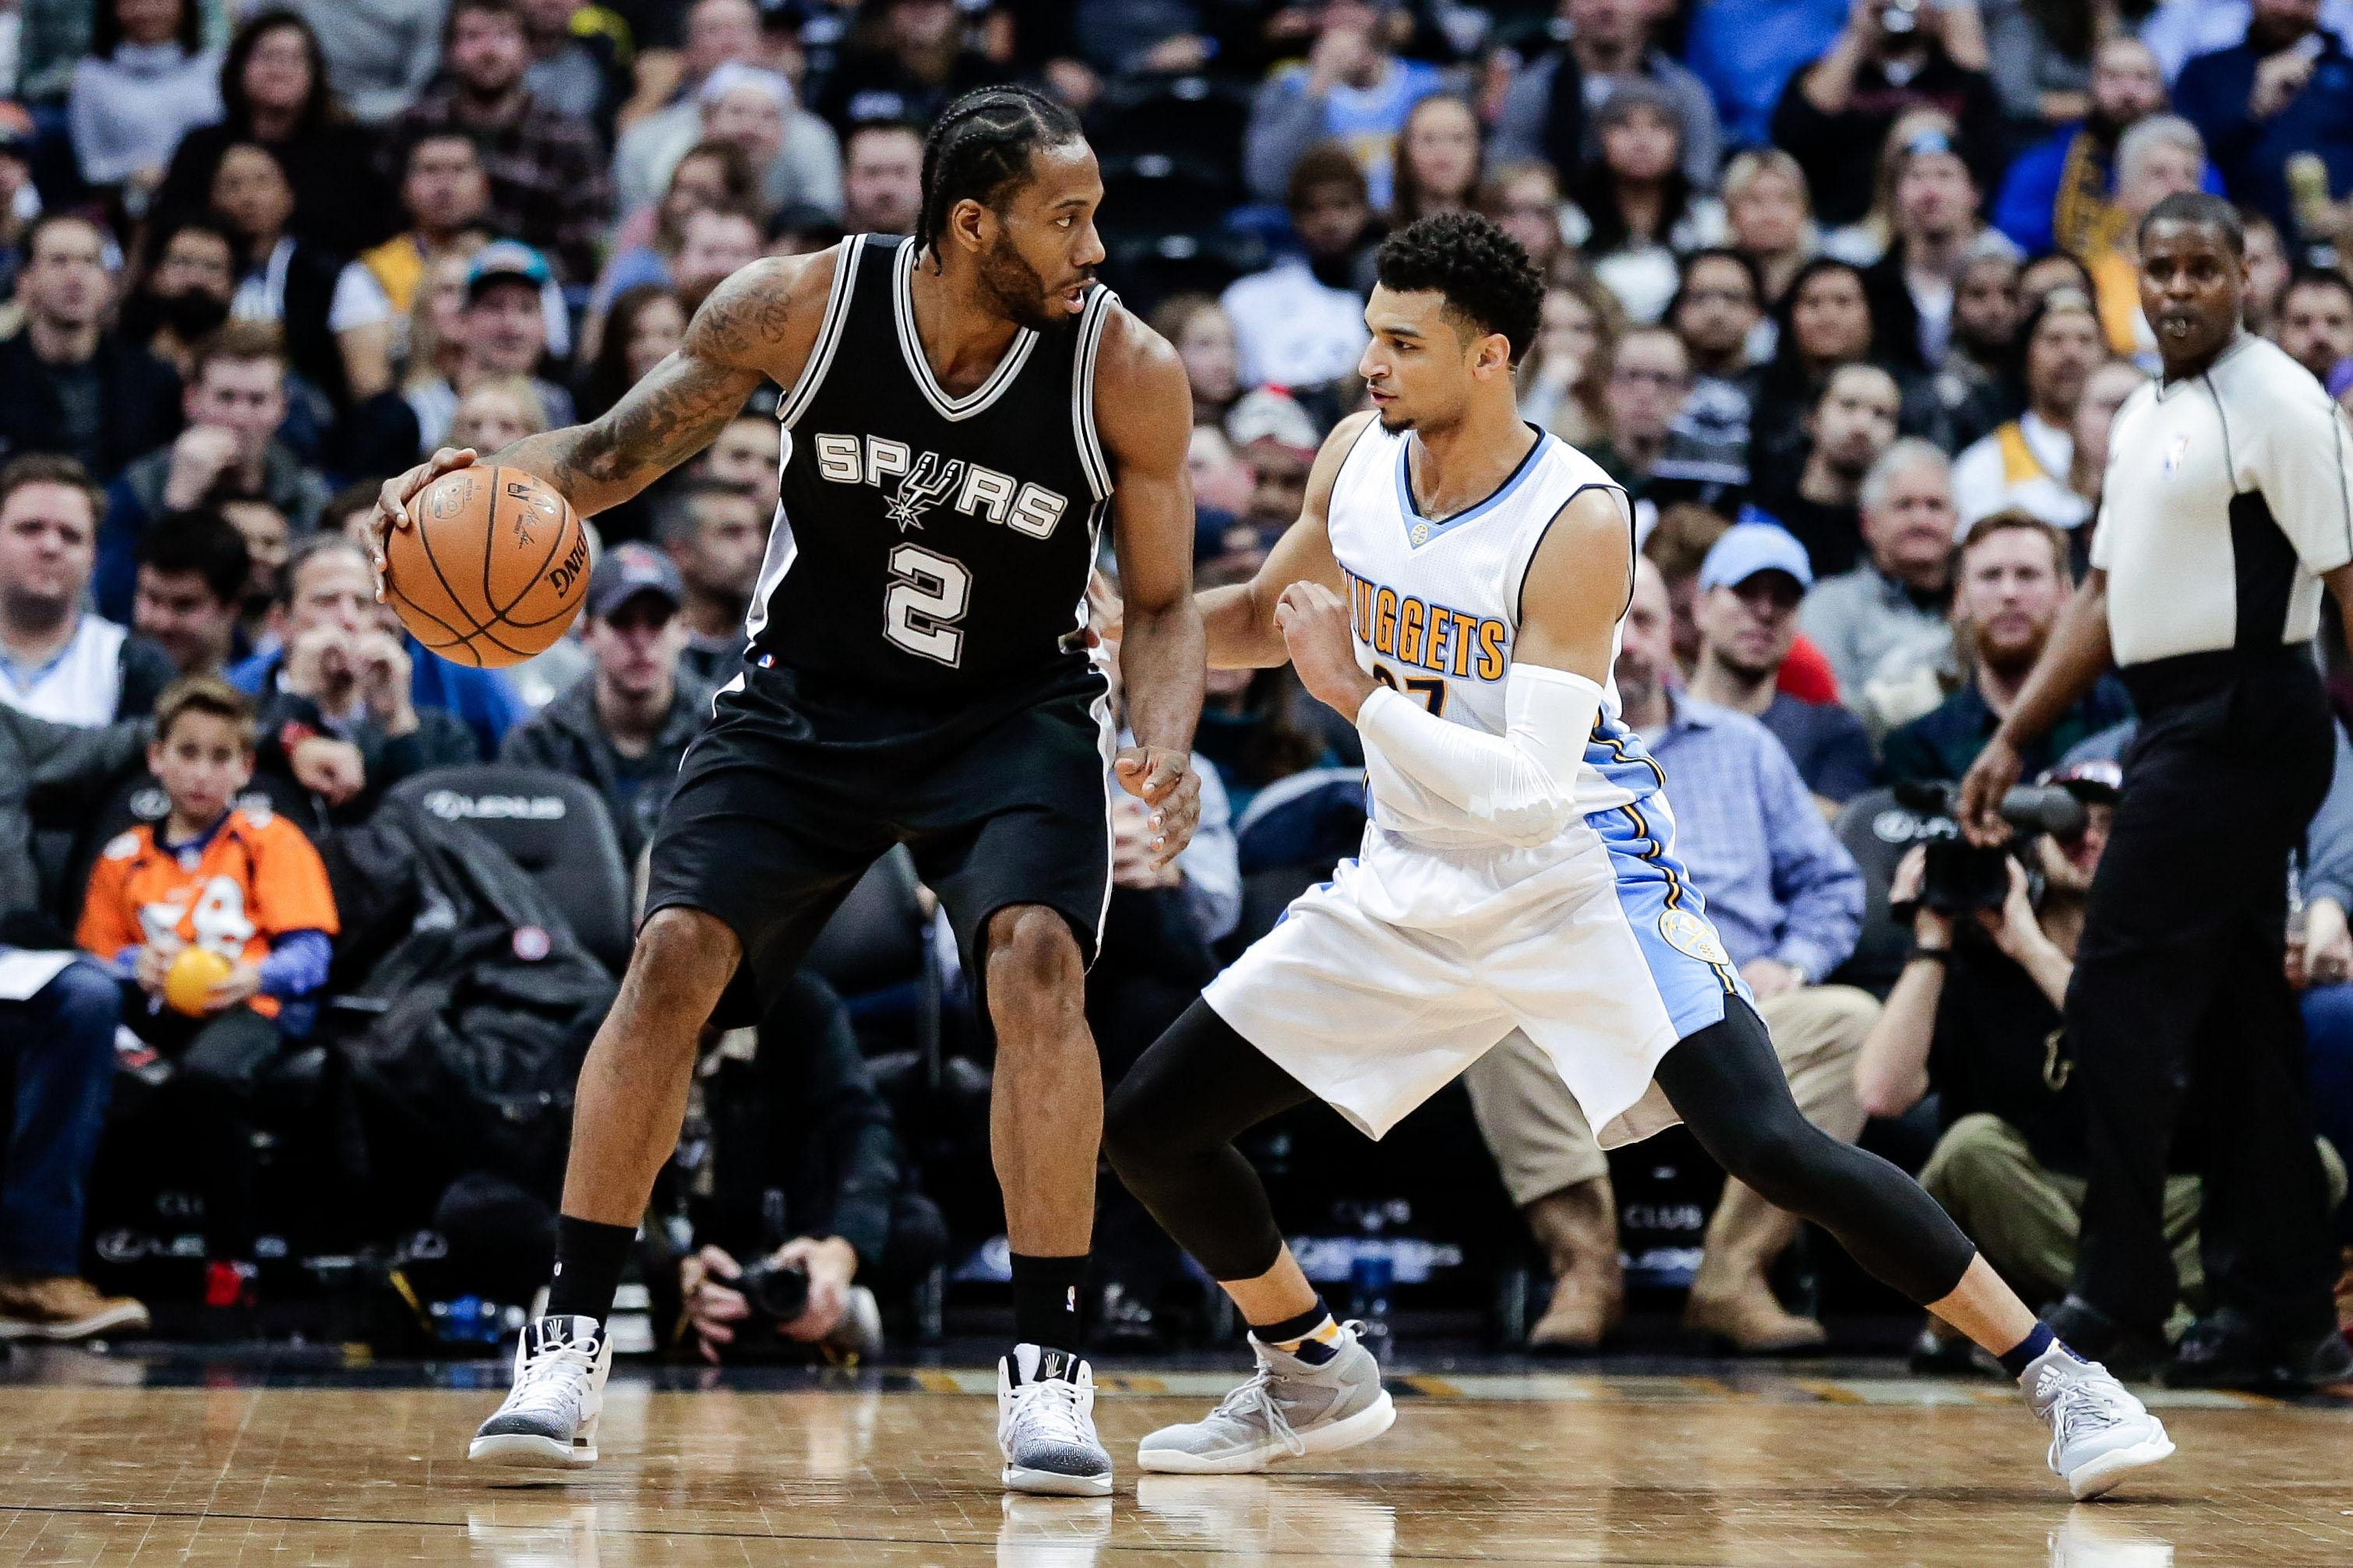 Denver Nuggets guard Jamal Murray (27) guards San Antonio Spurs forward Kawhi Leonard (2) in the fourth quarter at the Pepsi Center. The Spurs won 127-99.